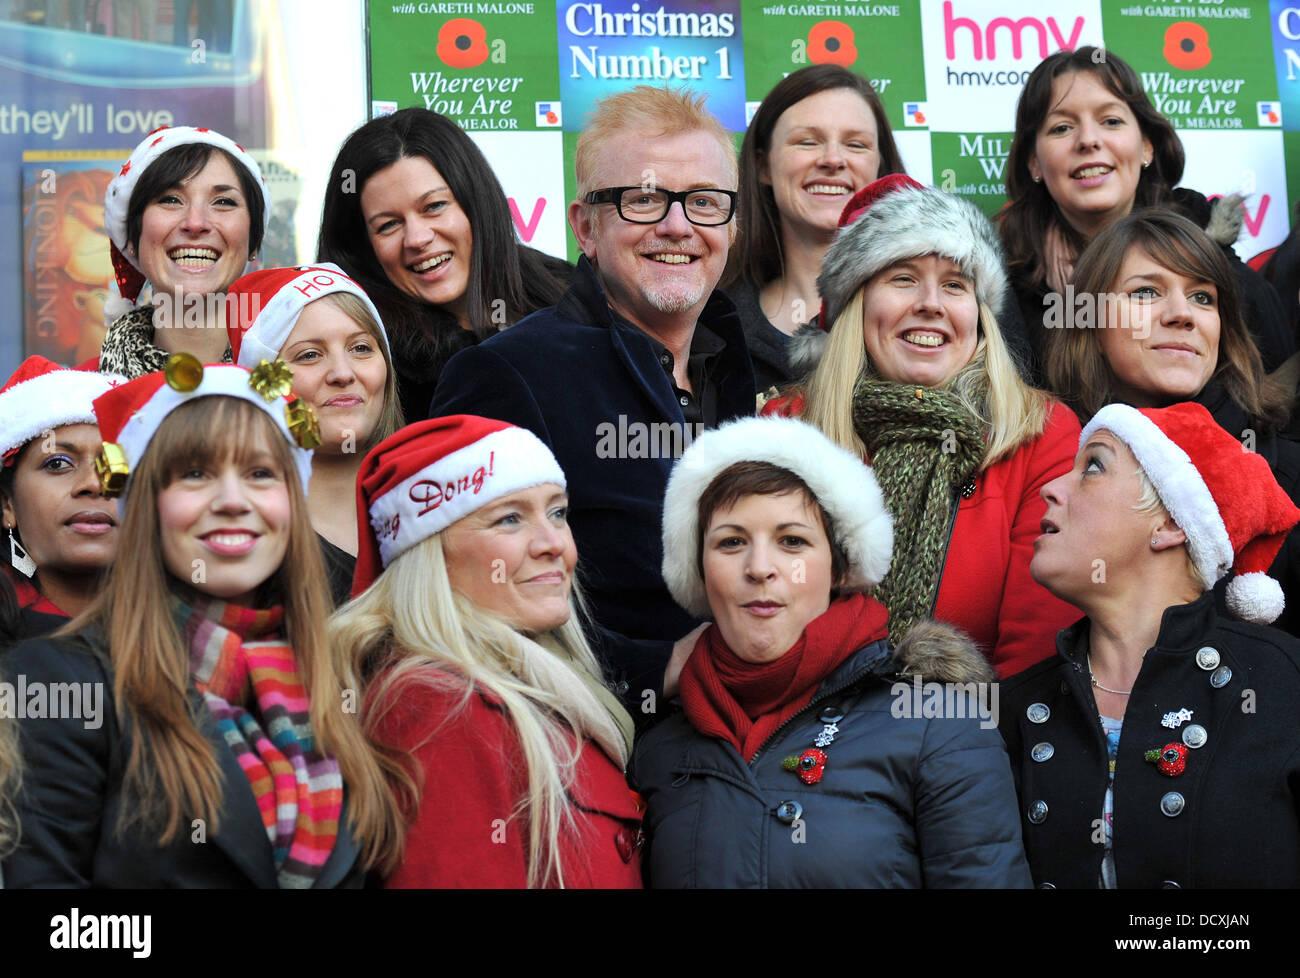 Chris Evans Members Military Wives Stockfotos & Chris Evans Members ...